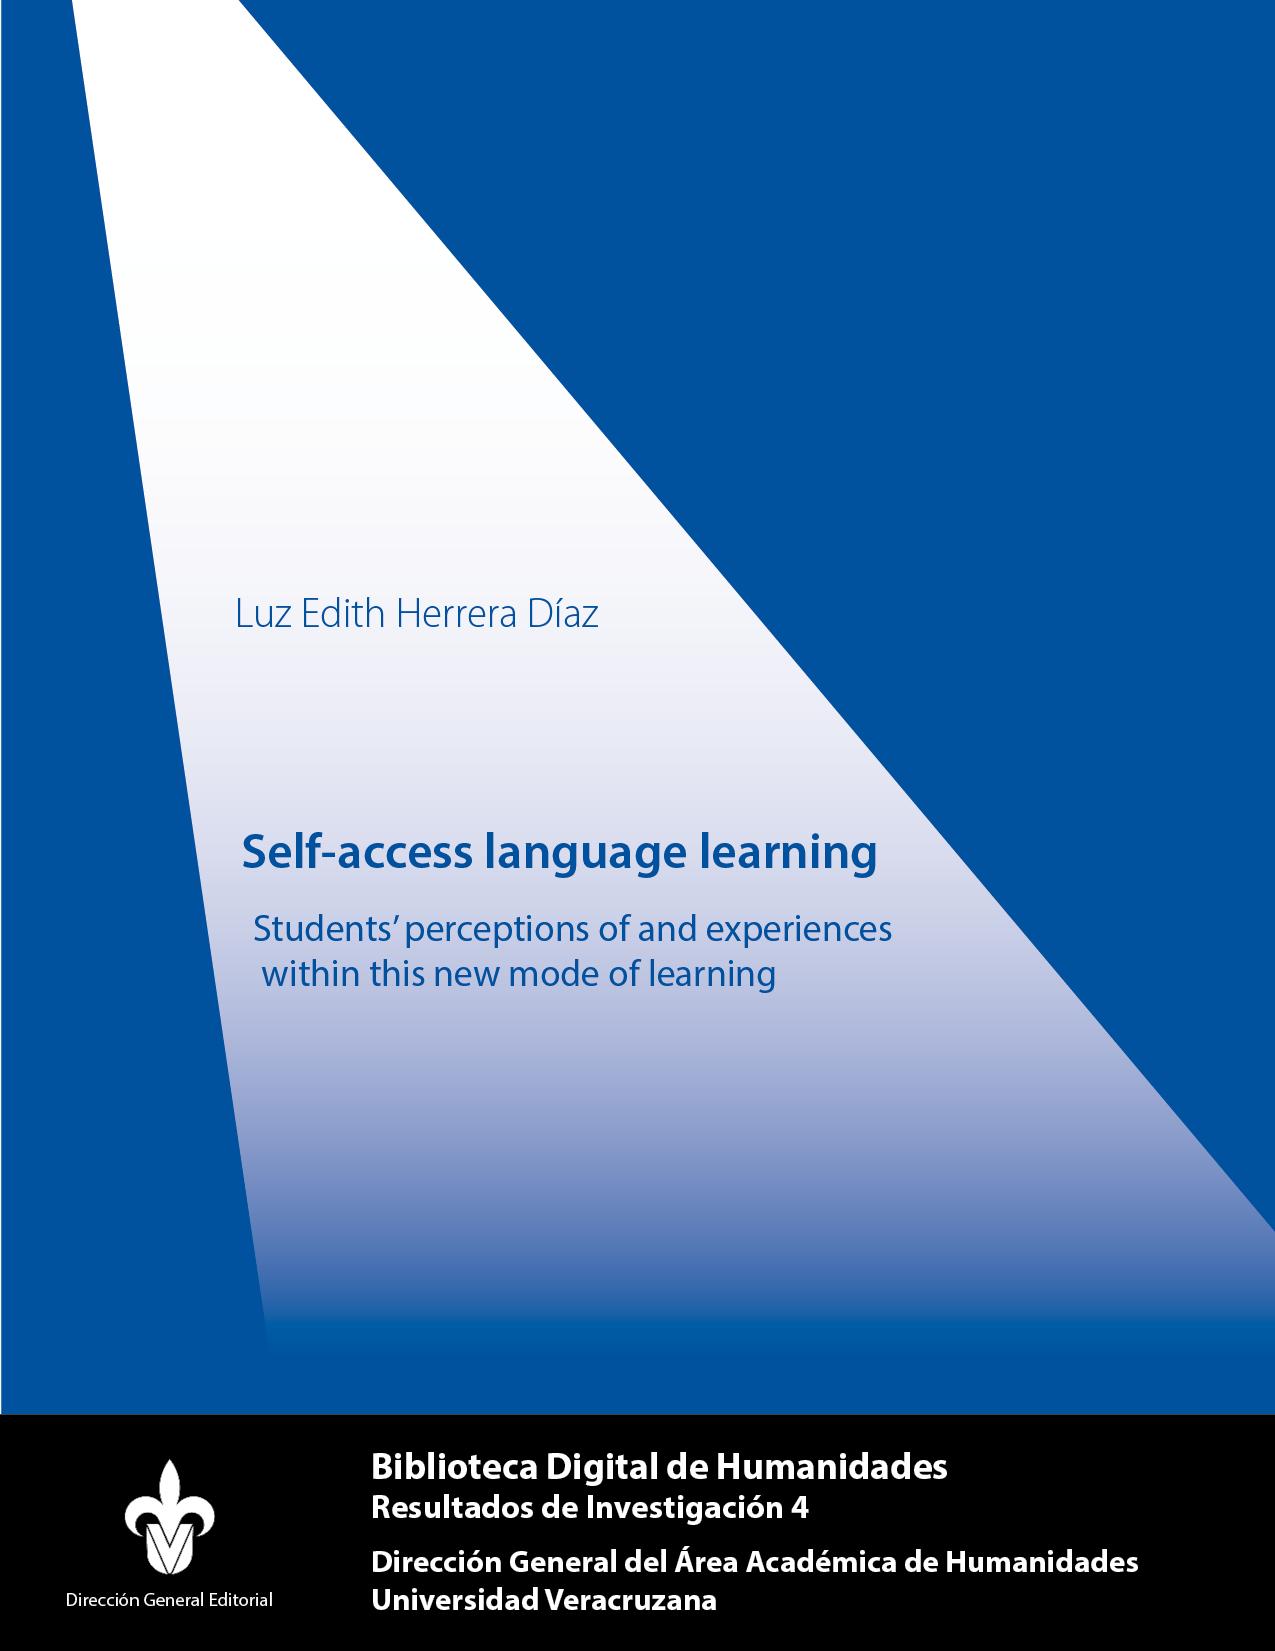 Self-access language learning